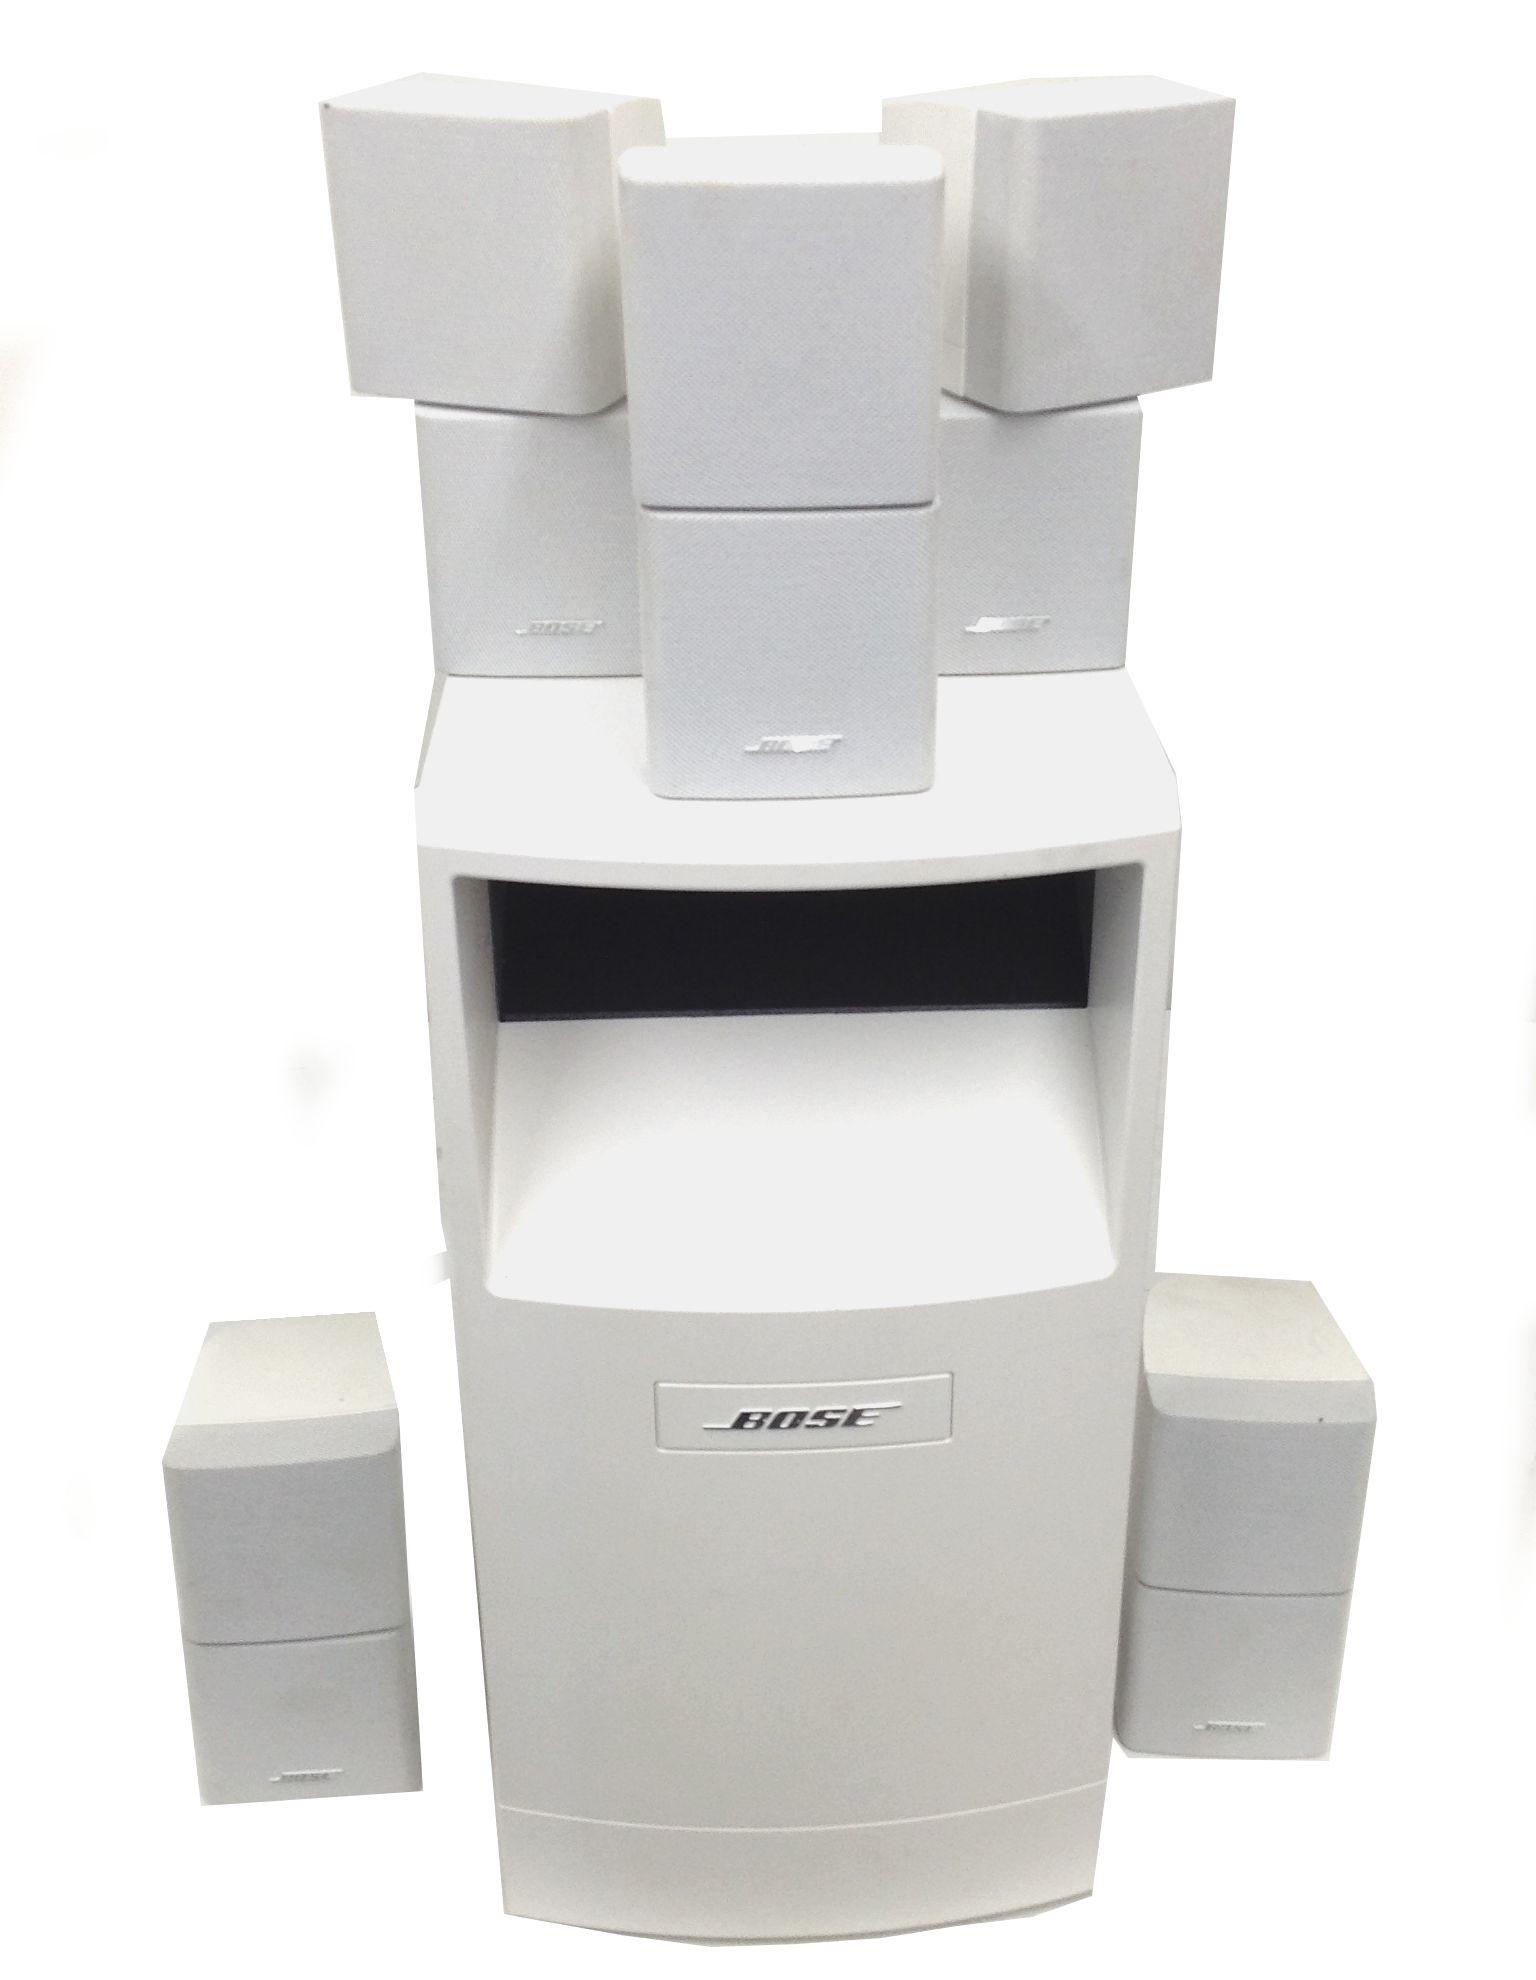 Bose Surround Sound System Acoustimass 10 Series III